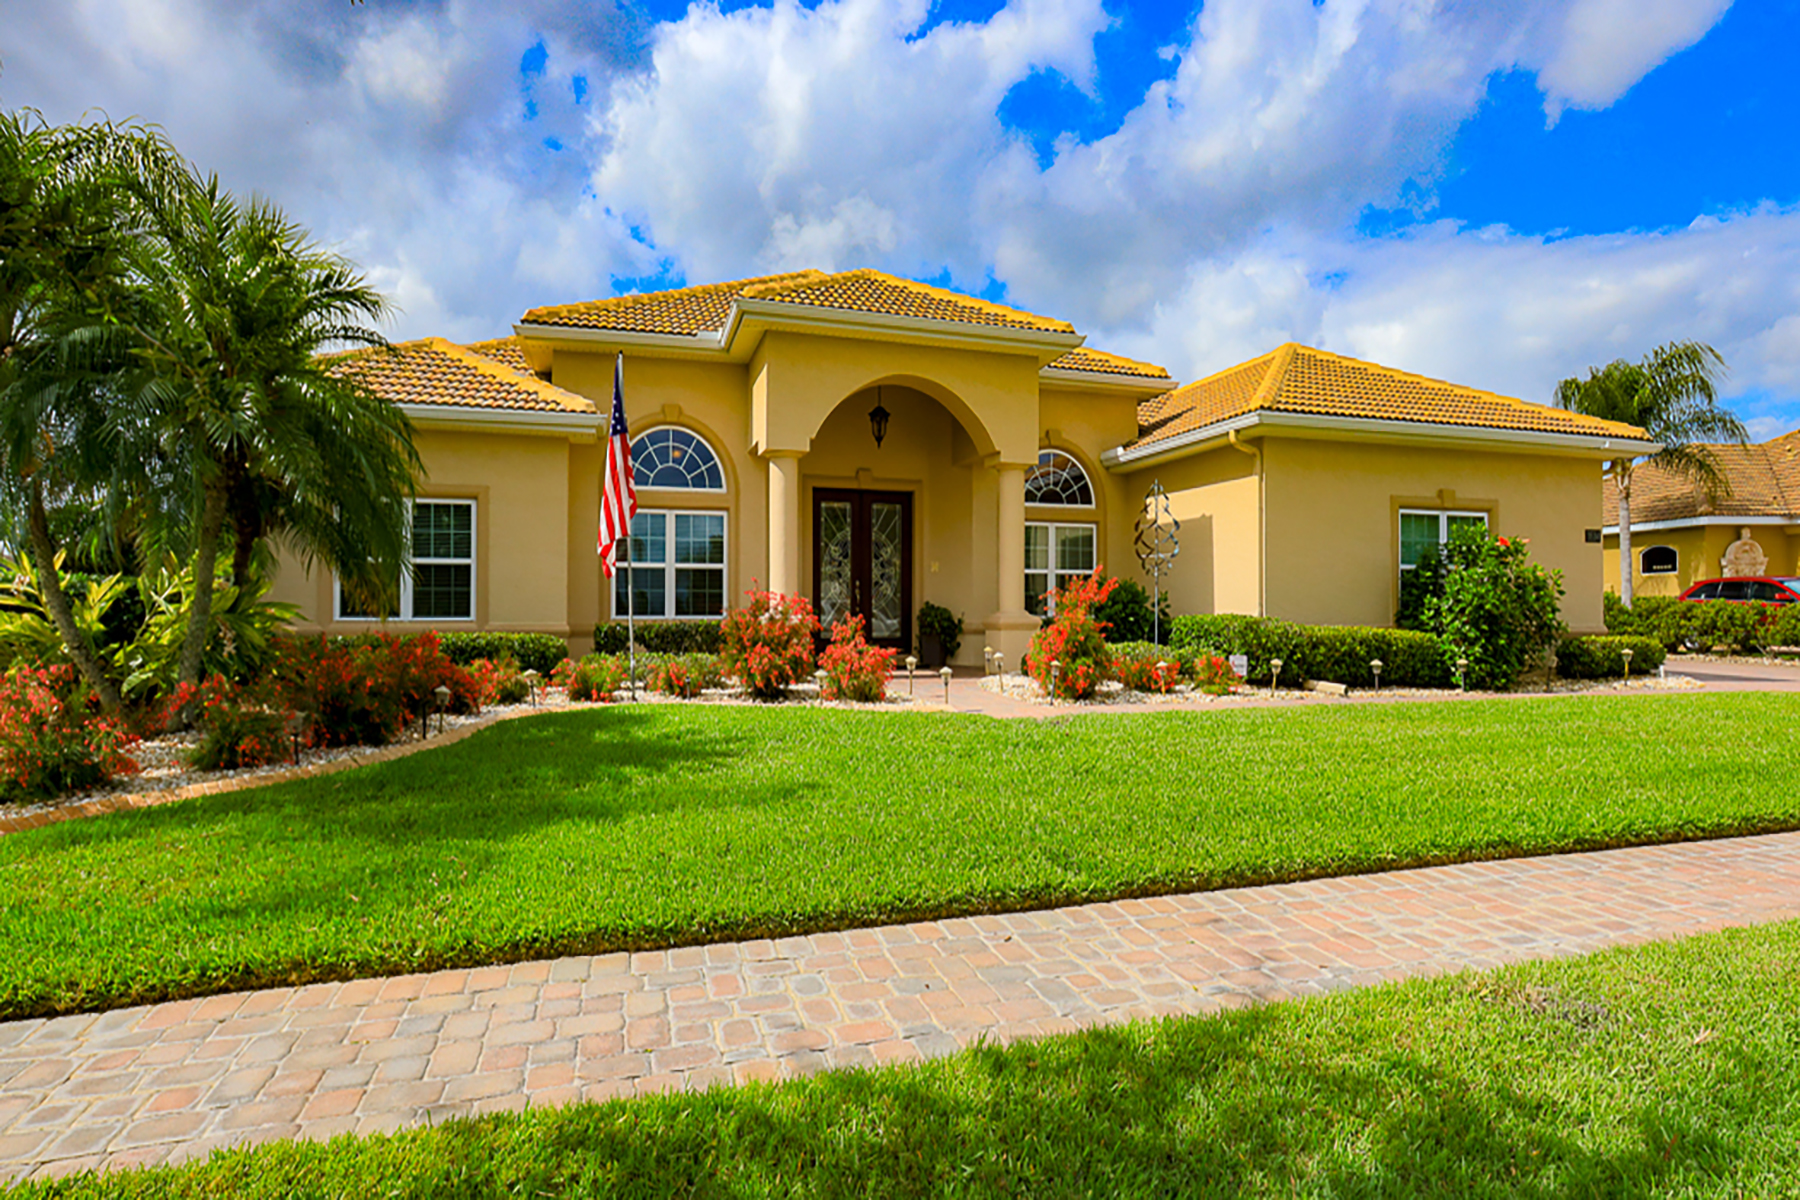 Single Family Homes for Active at New Smryna Beach 3534 Tuscany Reserve Blvd New Smyrna Beach, Florida 32168 United States